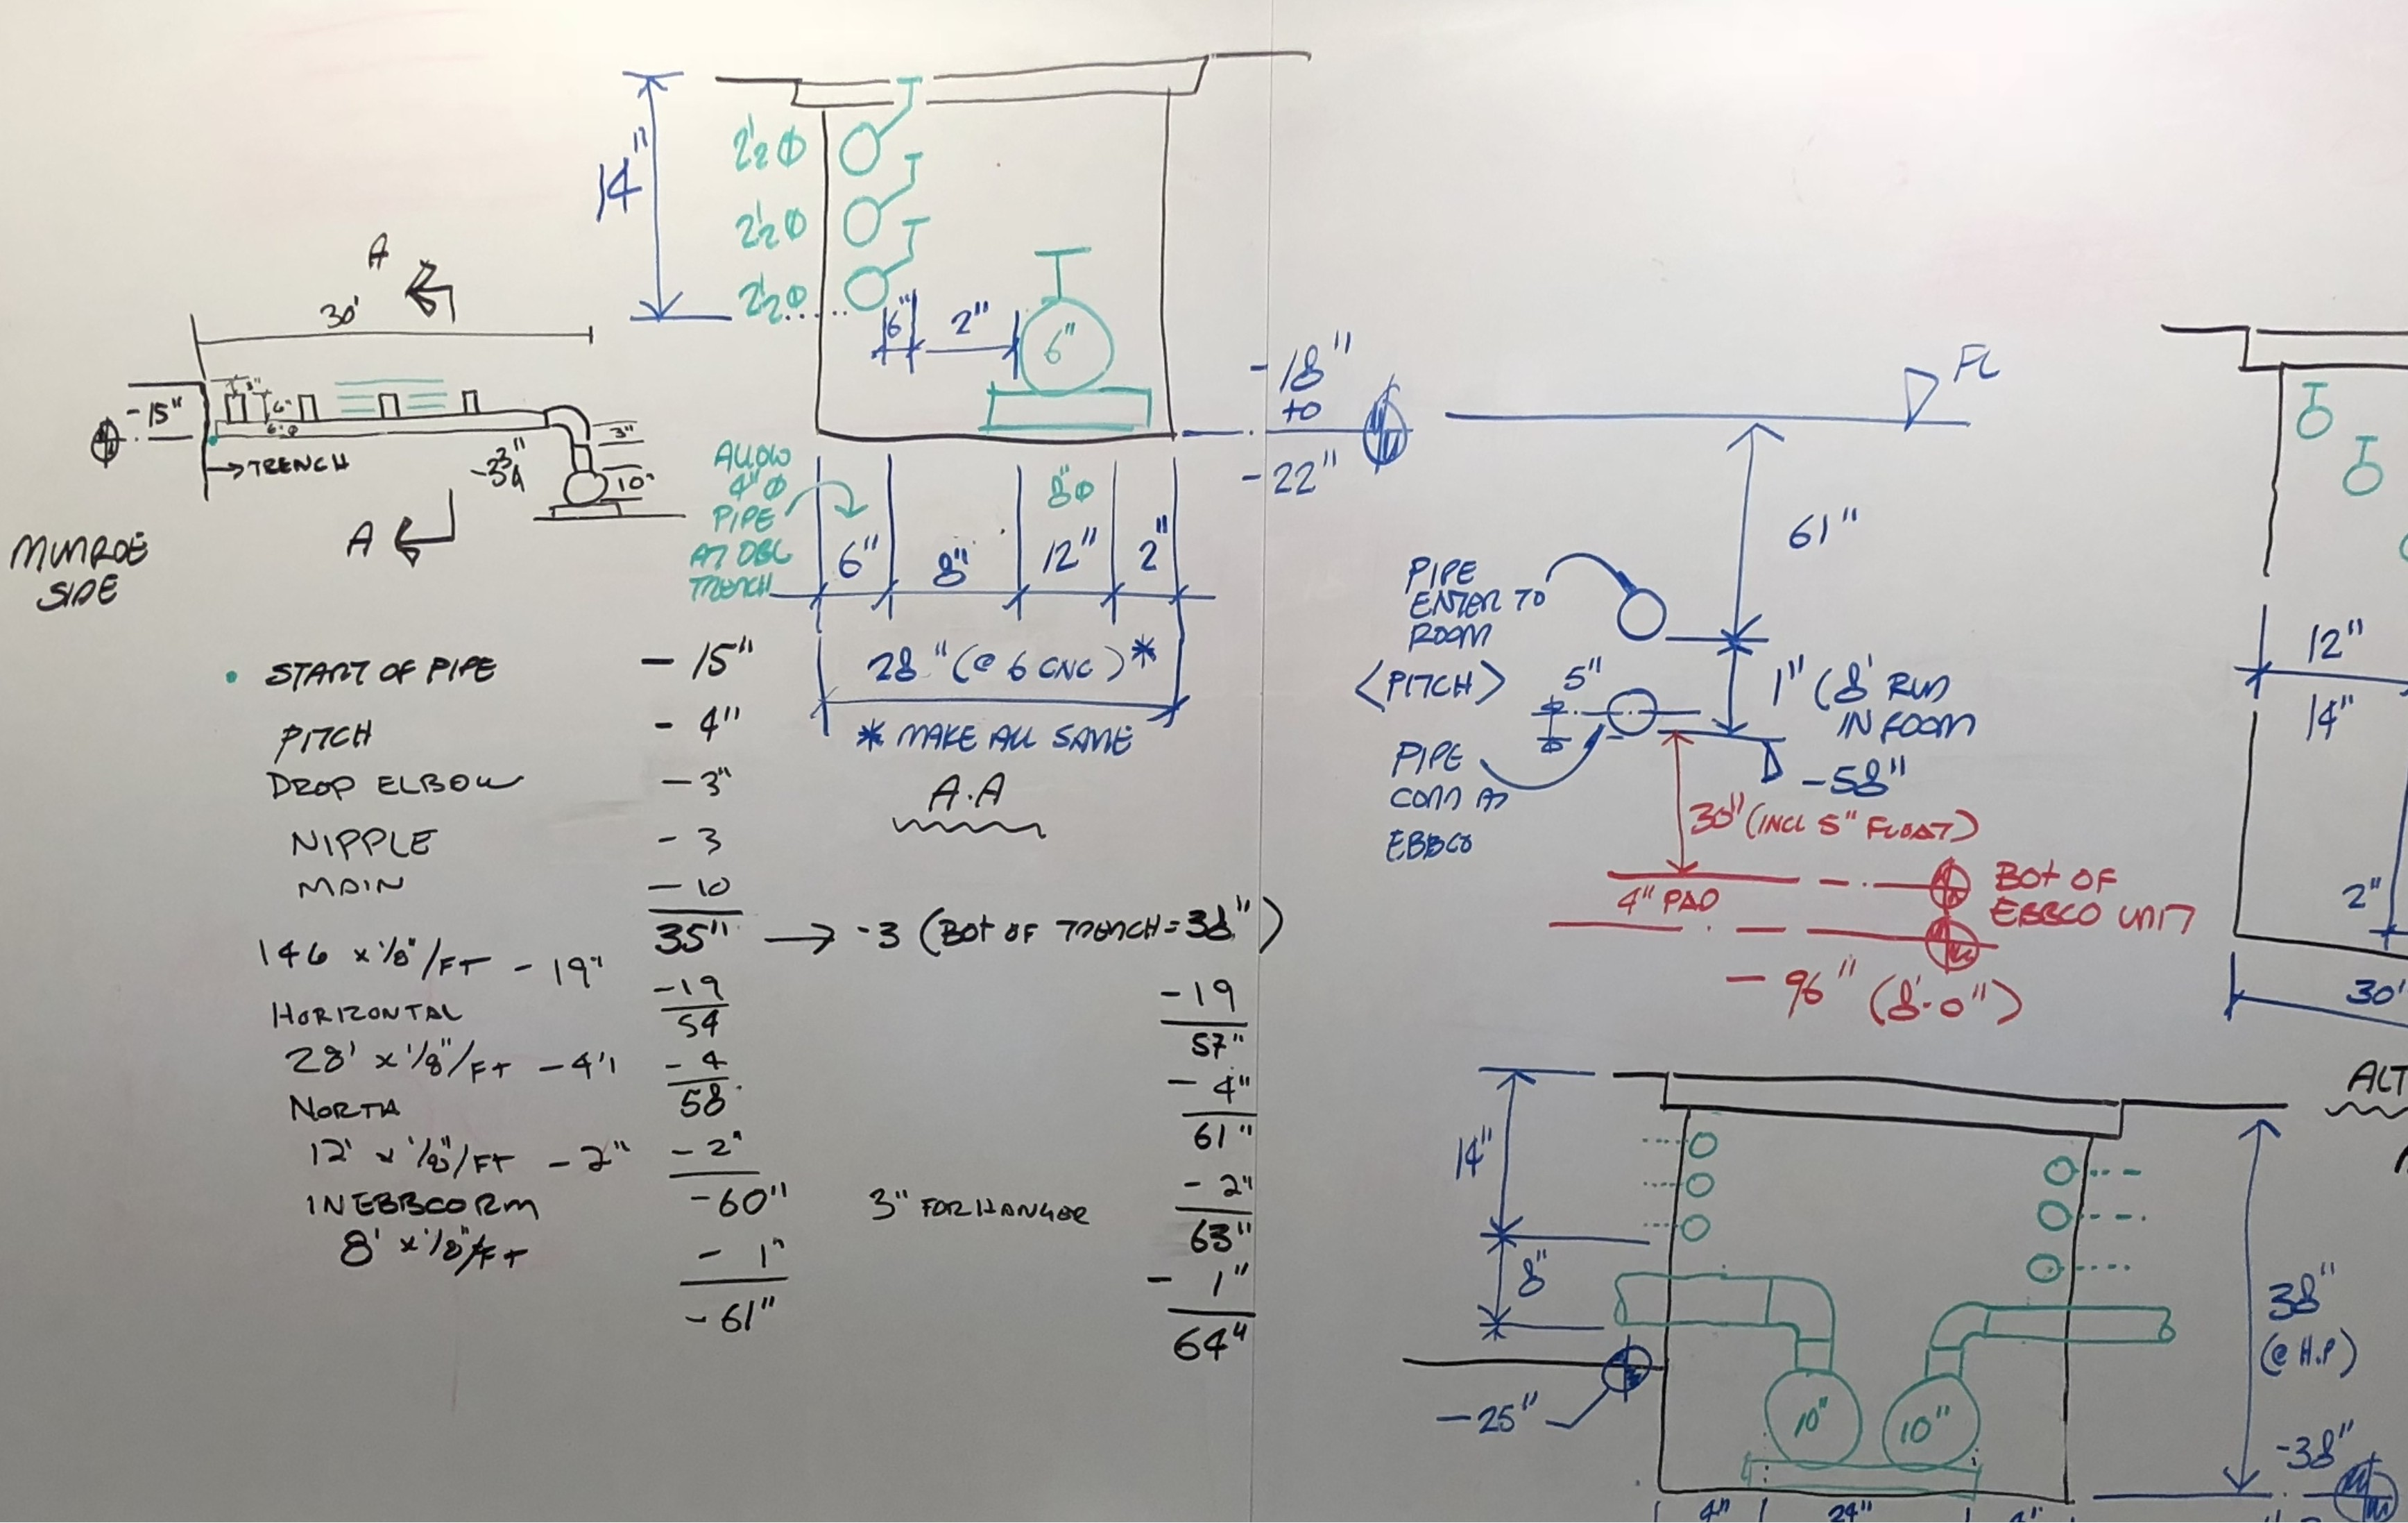 Harvey Performance Facility Trench Diagram